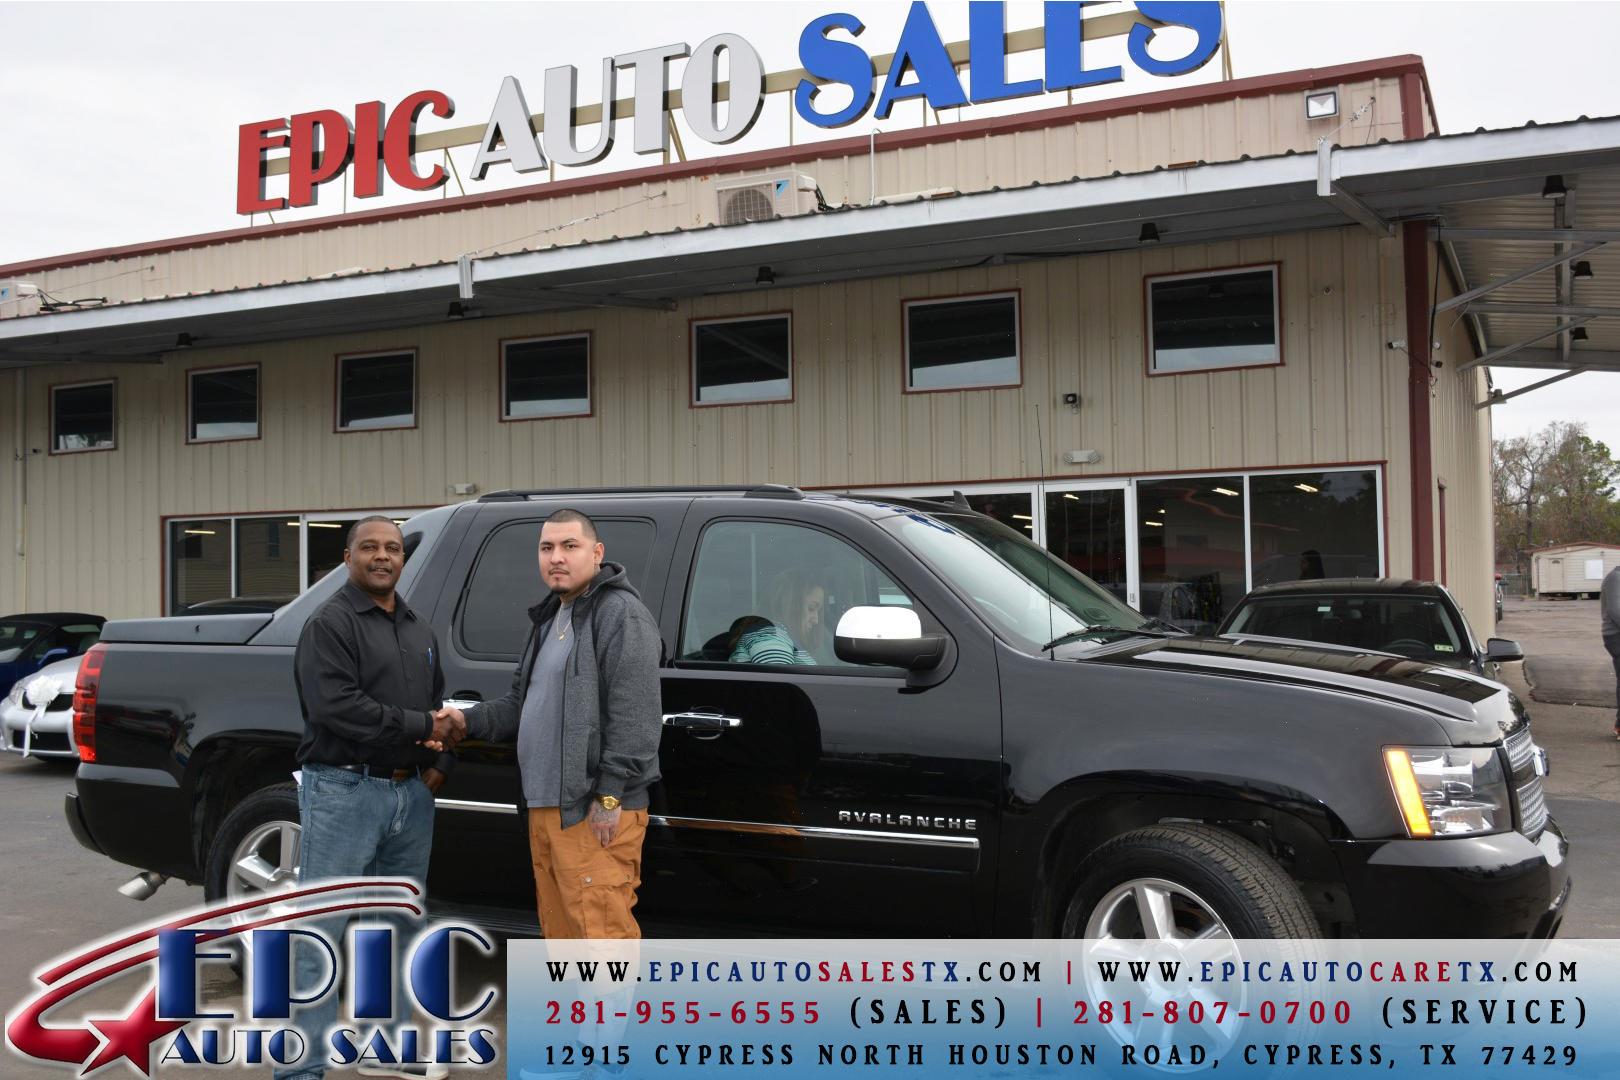 Epic Auto Sales image 1